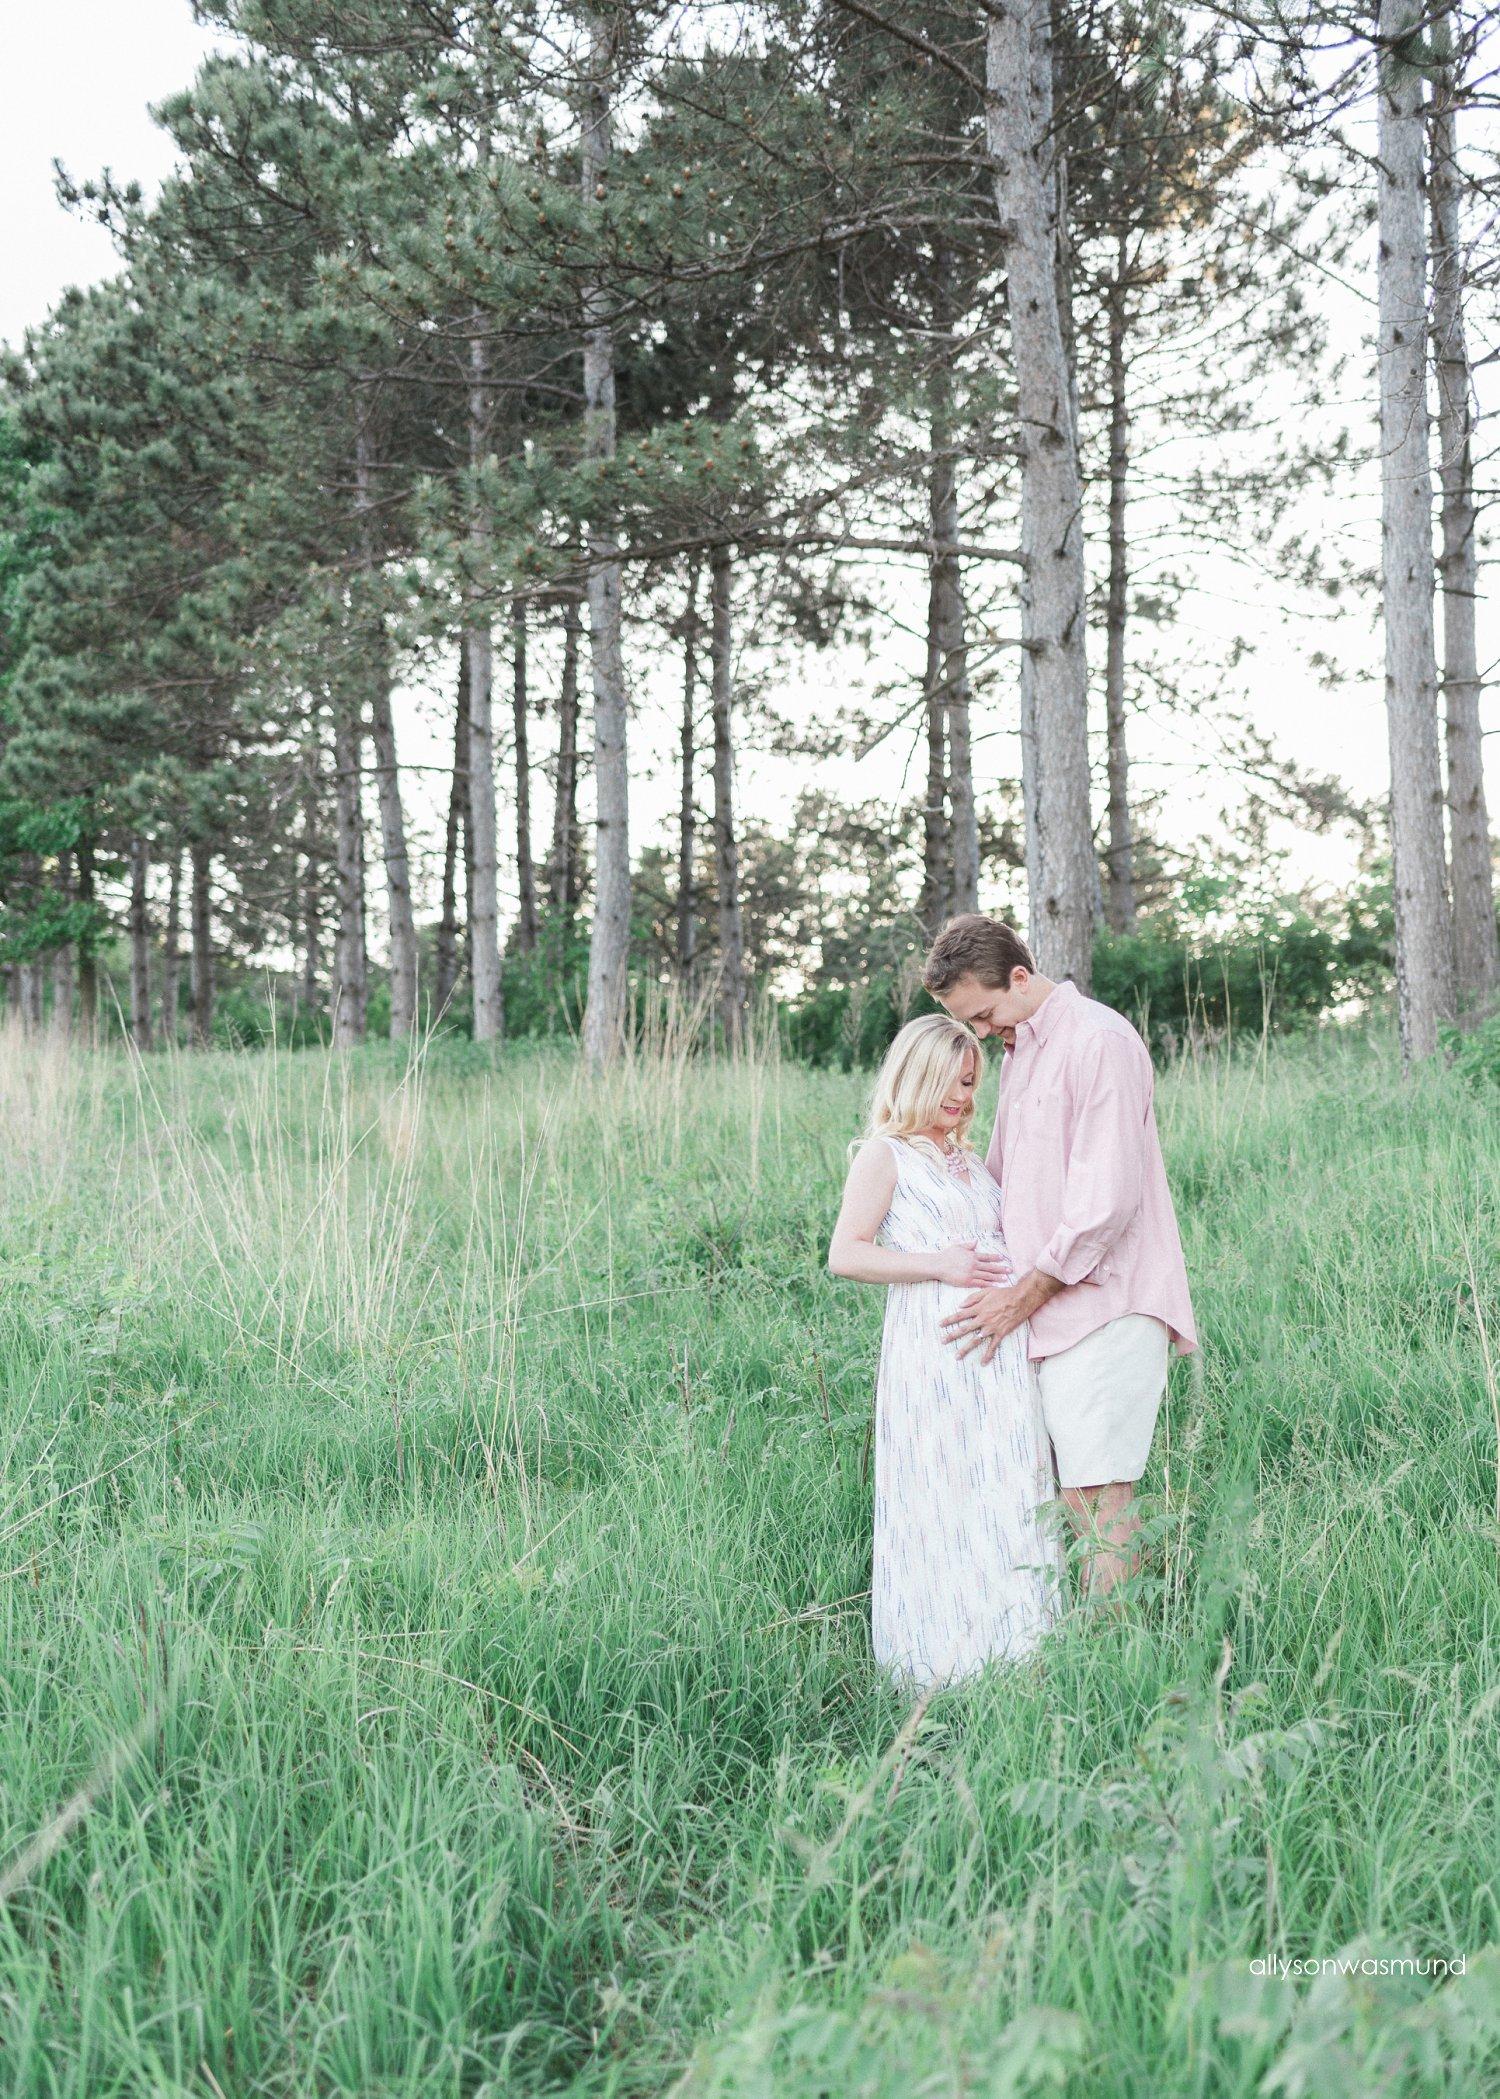 twin-cities-outdoor-maternity-photographer_0020.jpg